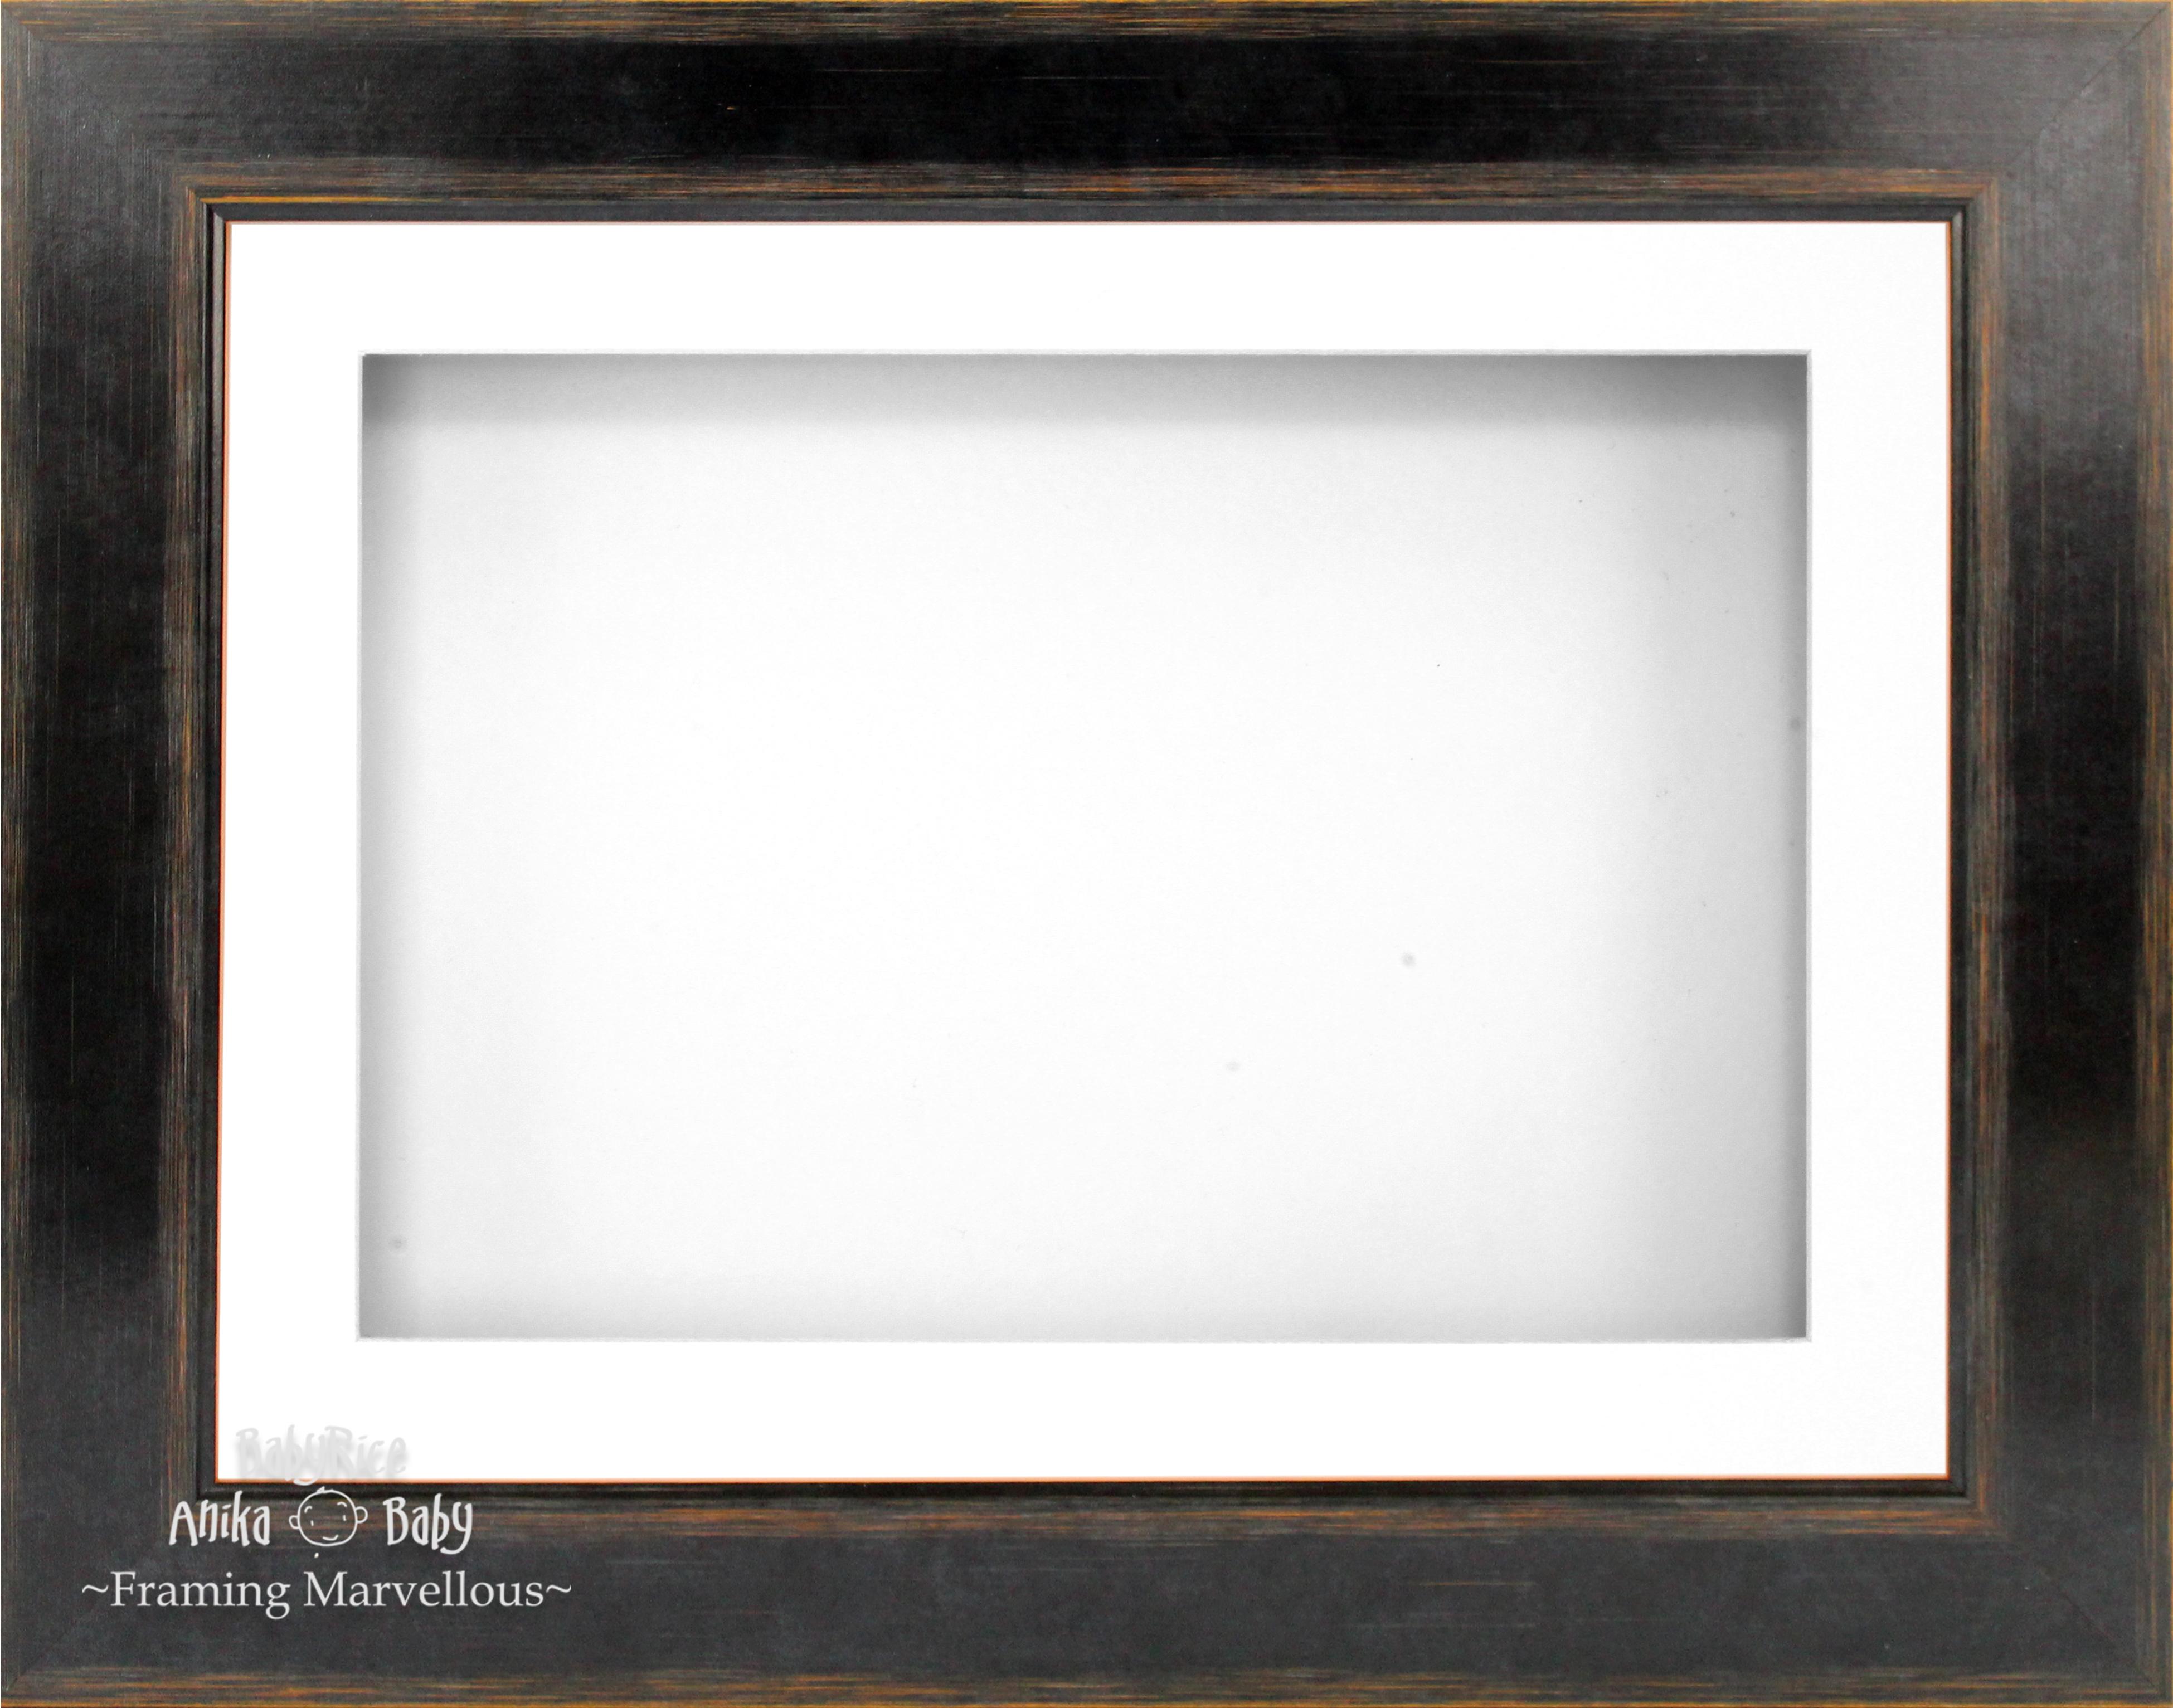 21.6cm X 29.2cm Schwarz Orange Deep Shadow Box Bilderrahmen Display ...